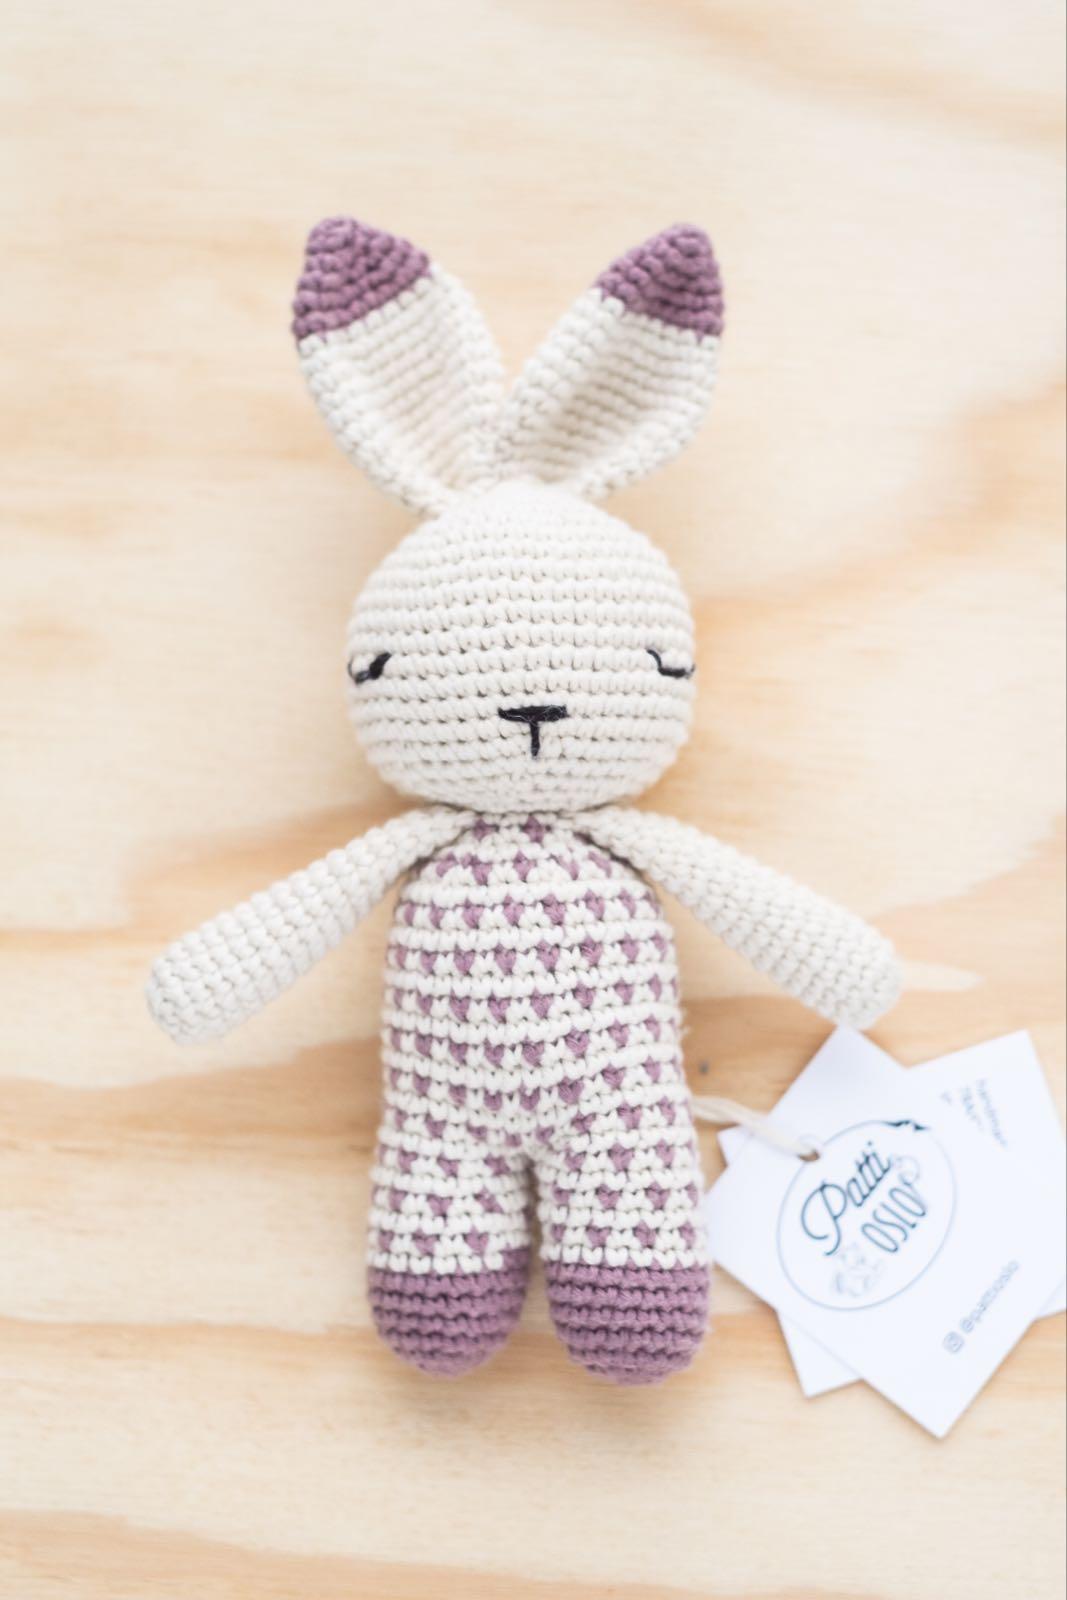 TOMT Patti Oslo - Rabbit